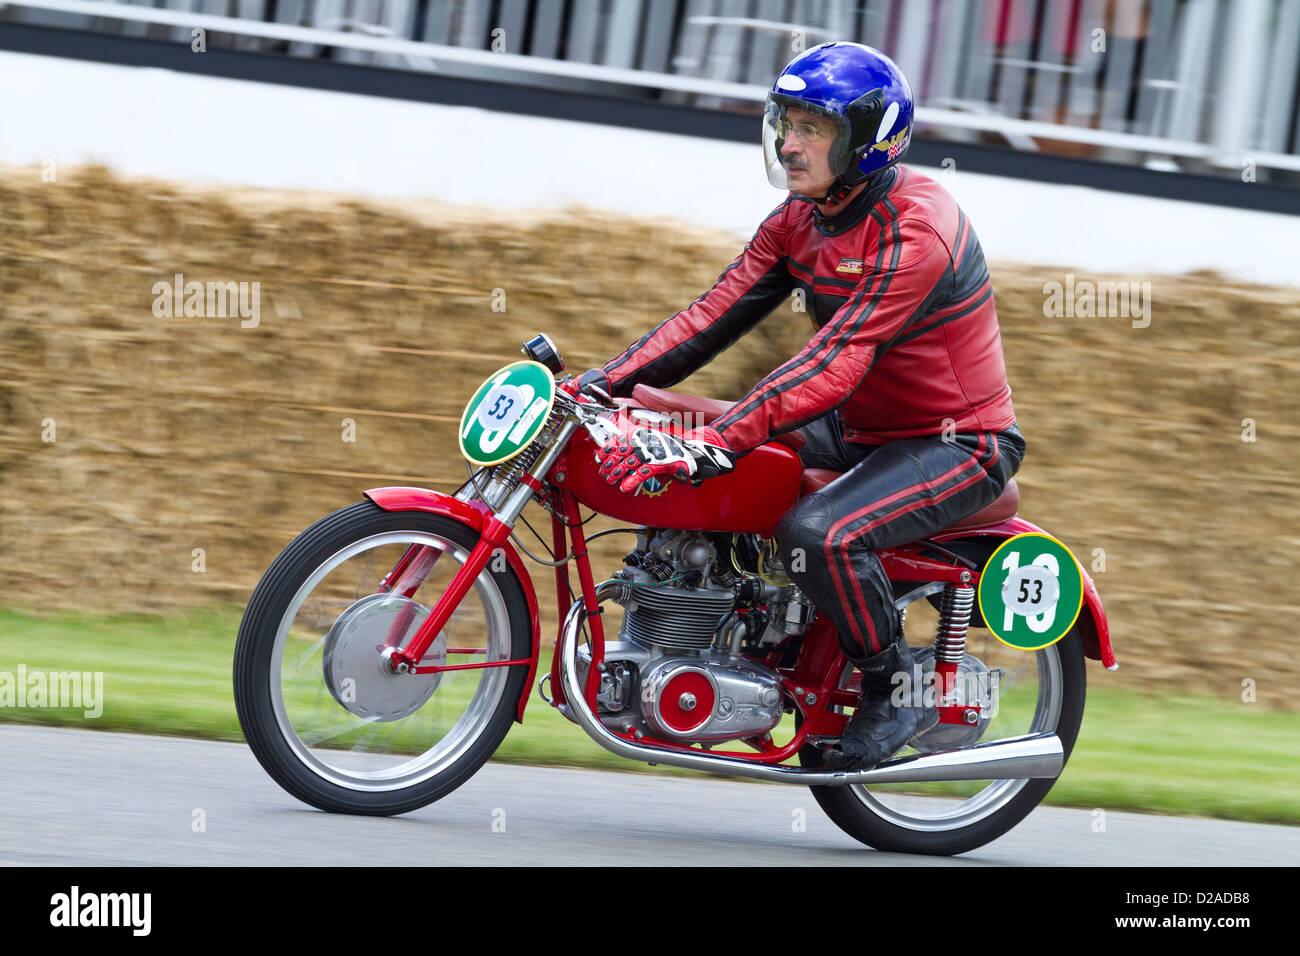 1953 MV Agusta Monoalbero avec rider Paul Galles au Goodwood Festival of Speed 2012, Sussex, UK. Banque D'Images